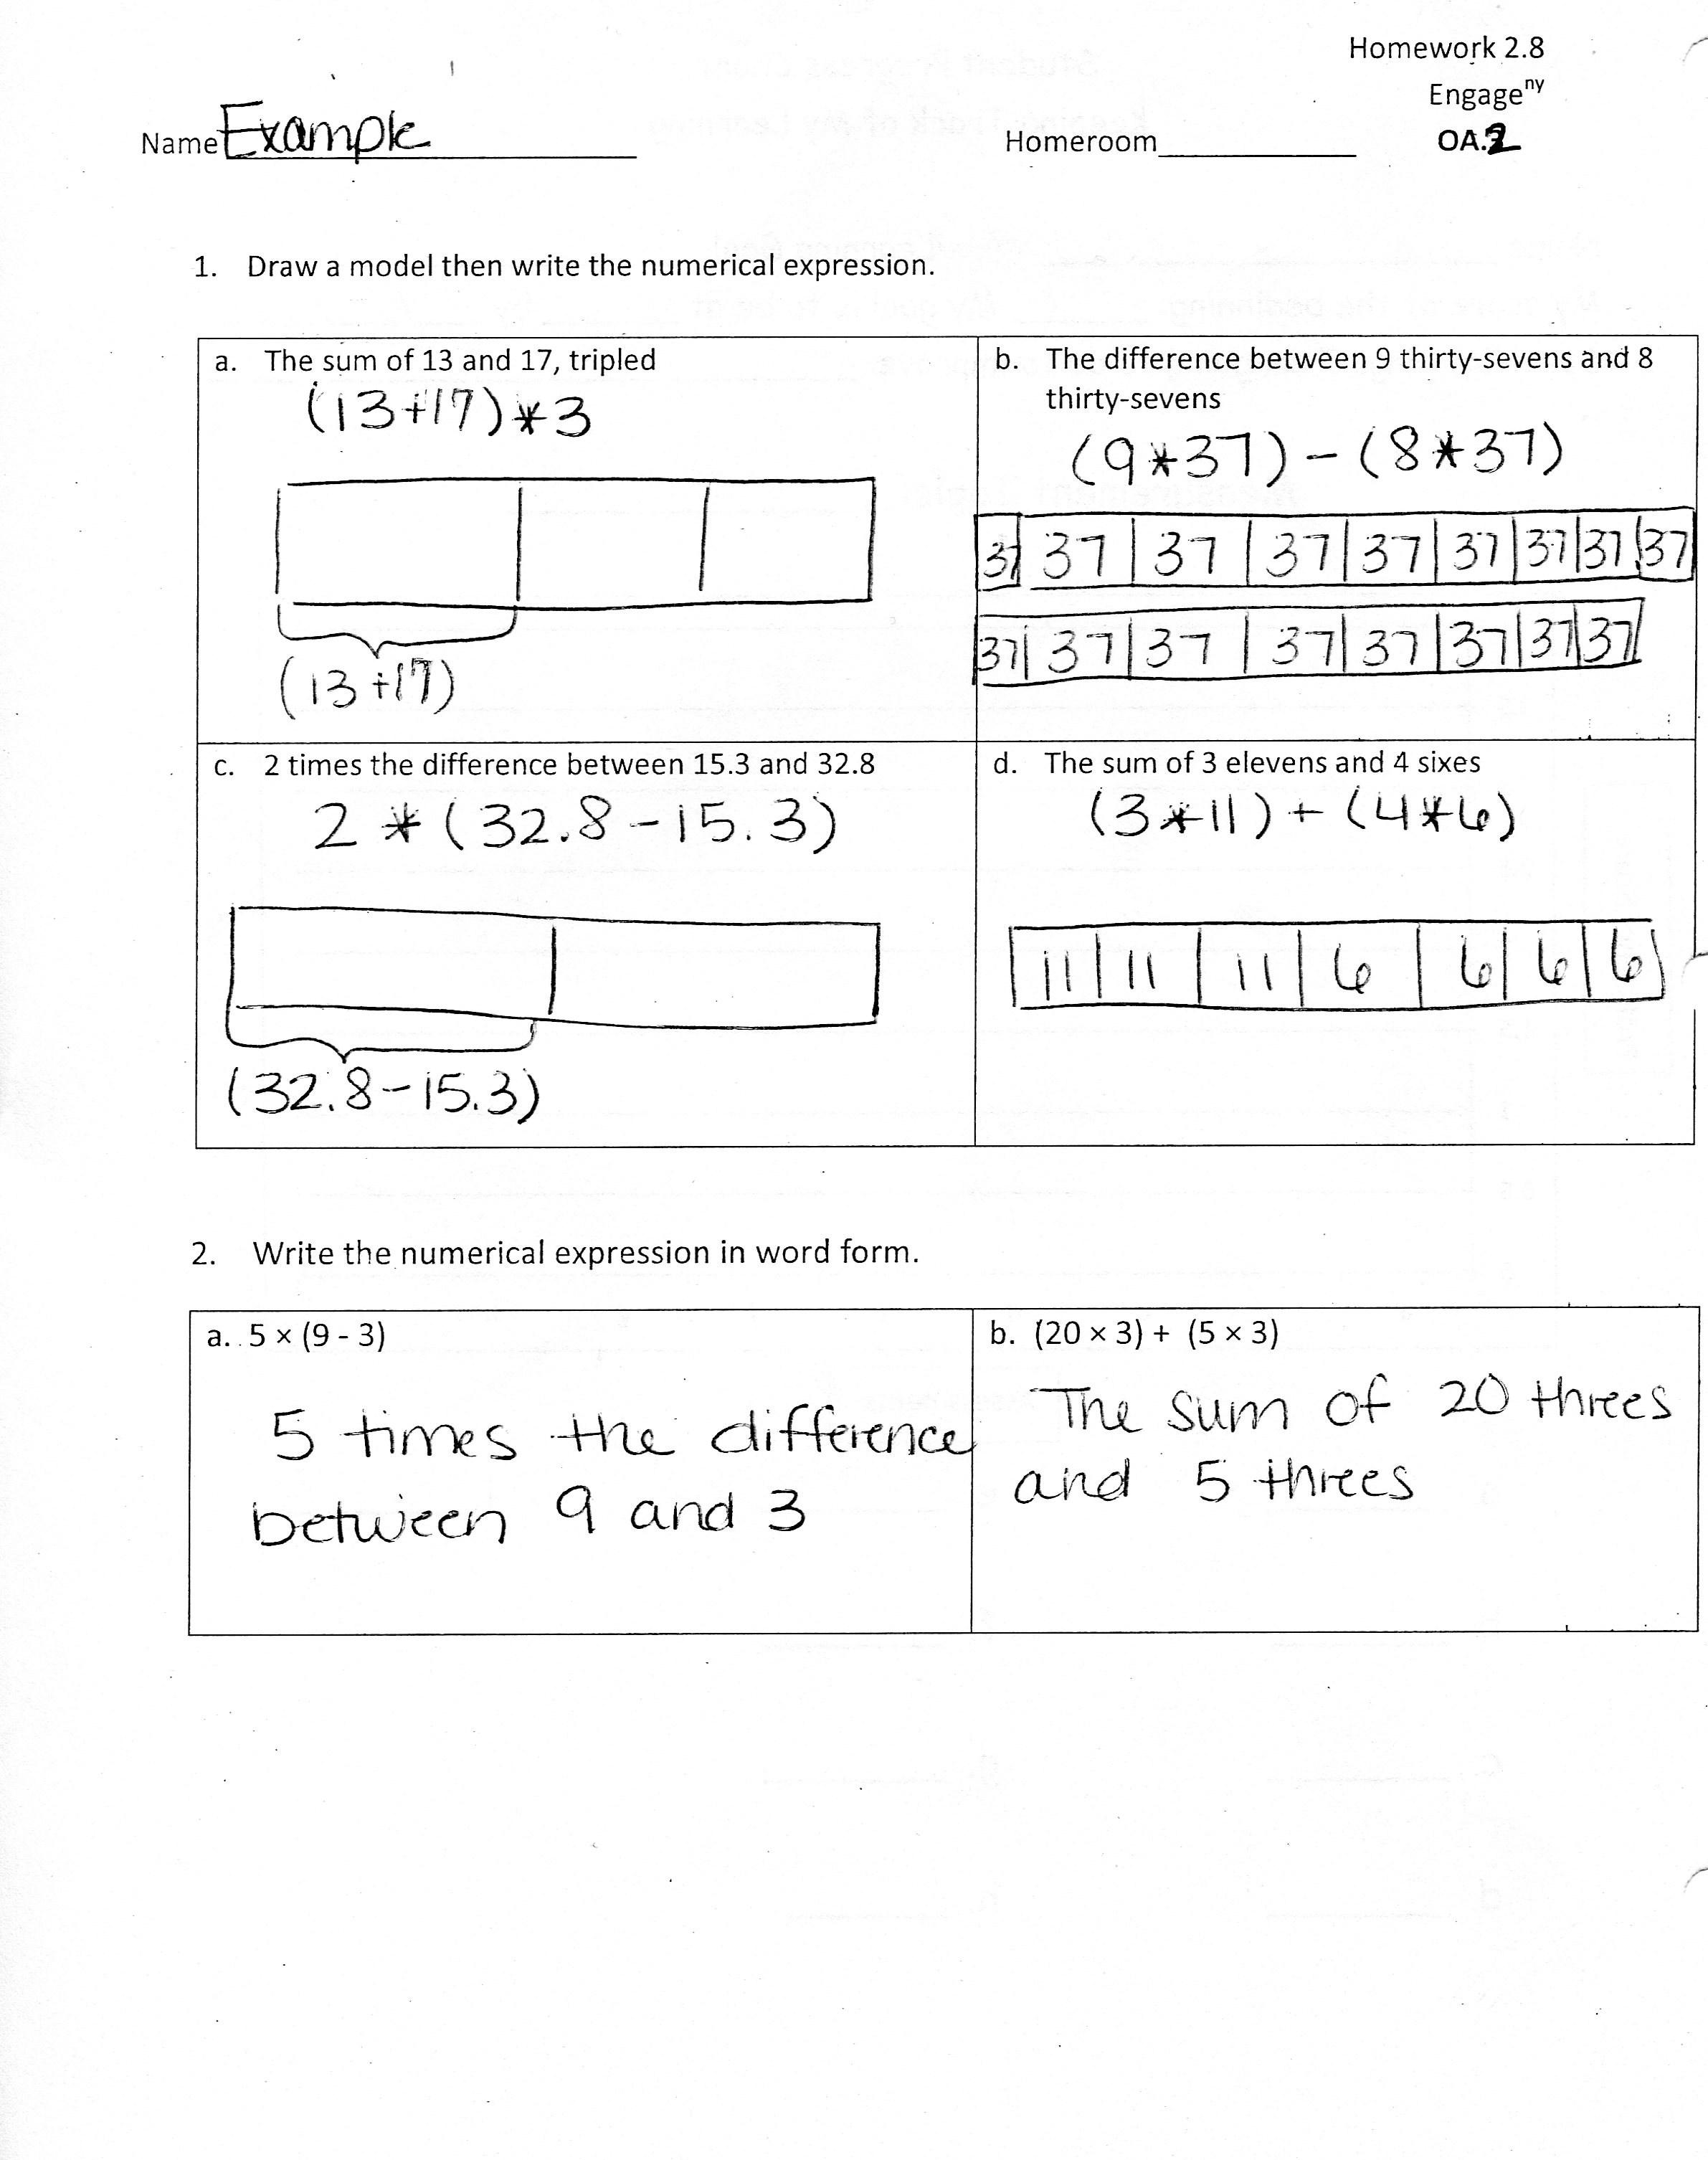 eureka math lesson 11 homework 5.1